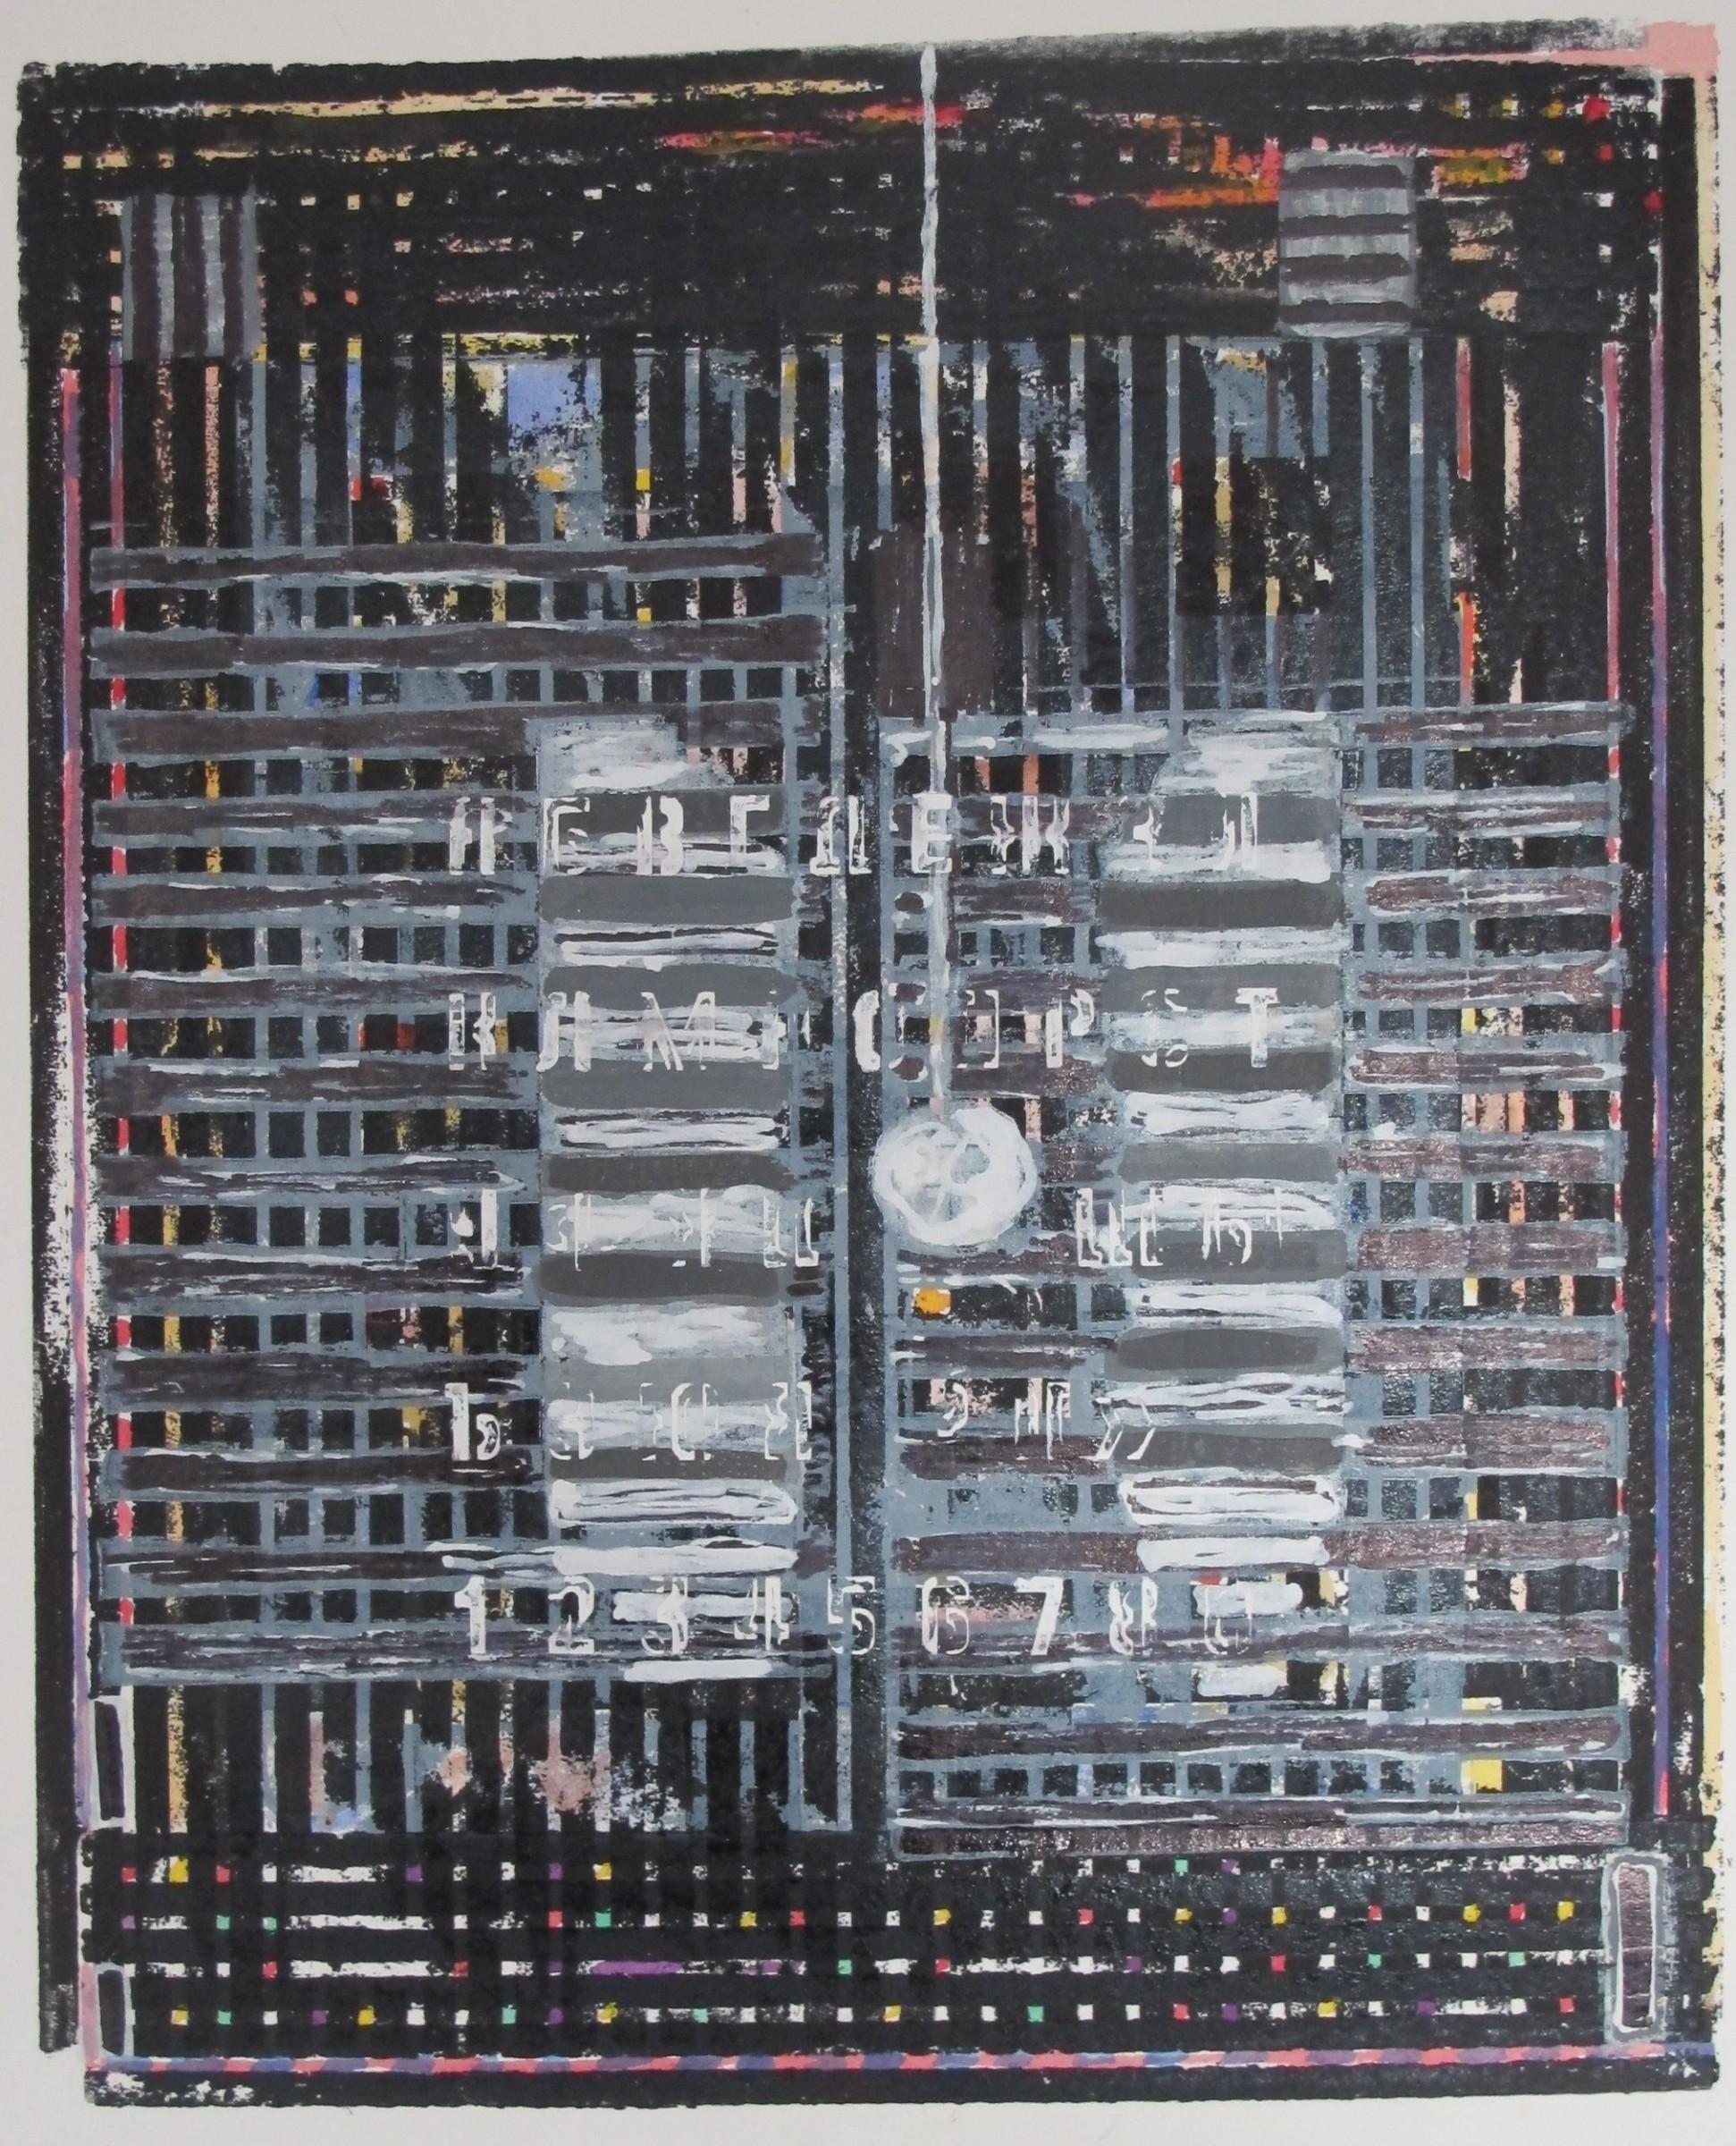 "<span class=""link fancybox-details-link""><a href=""/exhibitions/17/works/image_standalone788/"">View Detail Page</a></span><p><strong>Philip Ritson</strong></p><p>Pendulum</p><p>linocut & watercolour, 1/1</p><p>70 x 50cm</p><p>£400 framed</p><p>£300 unframed</p>"